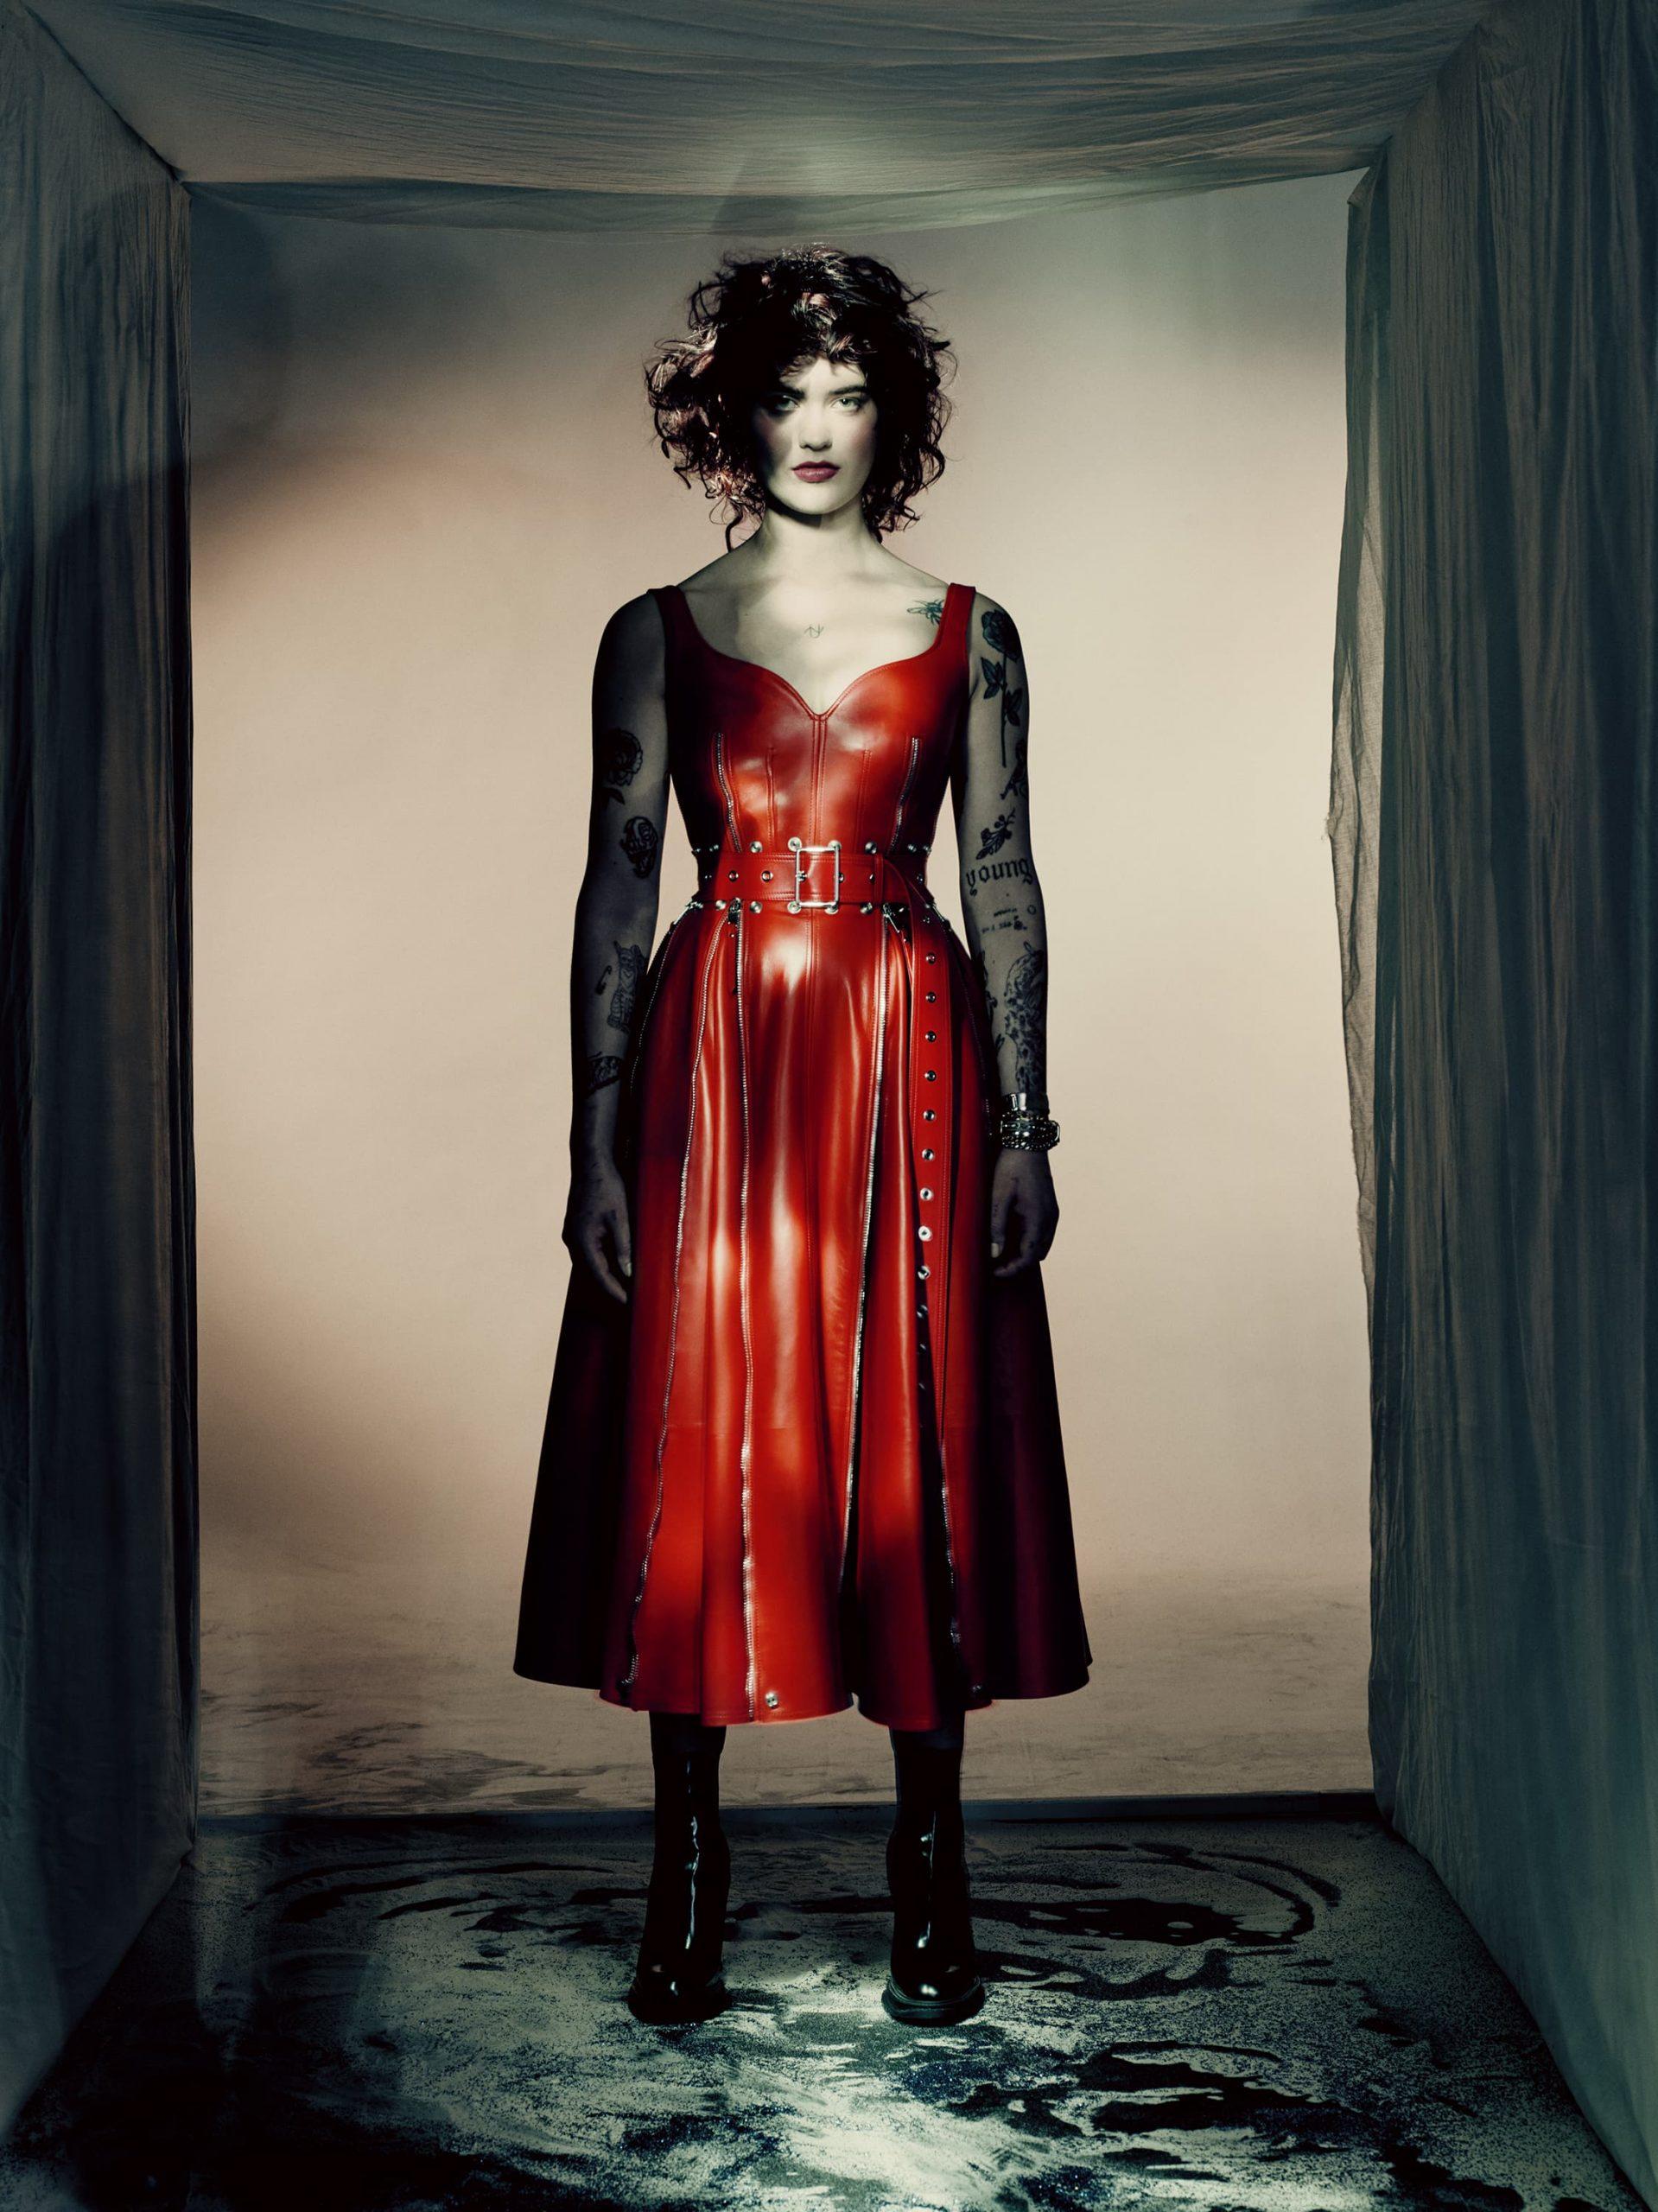 Alexander McQueen Anemones Fall 2021 Ad Campaign Photos